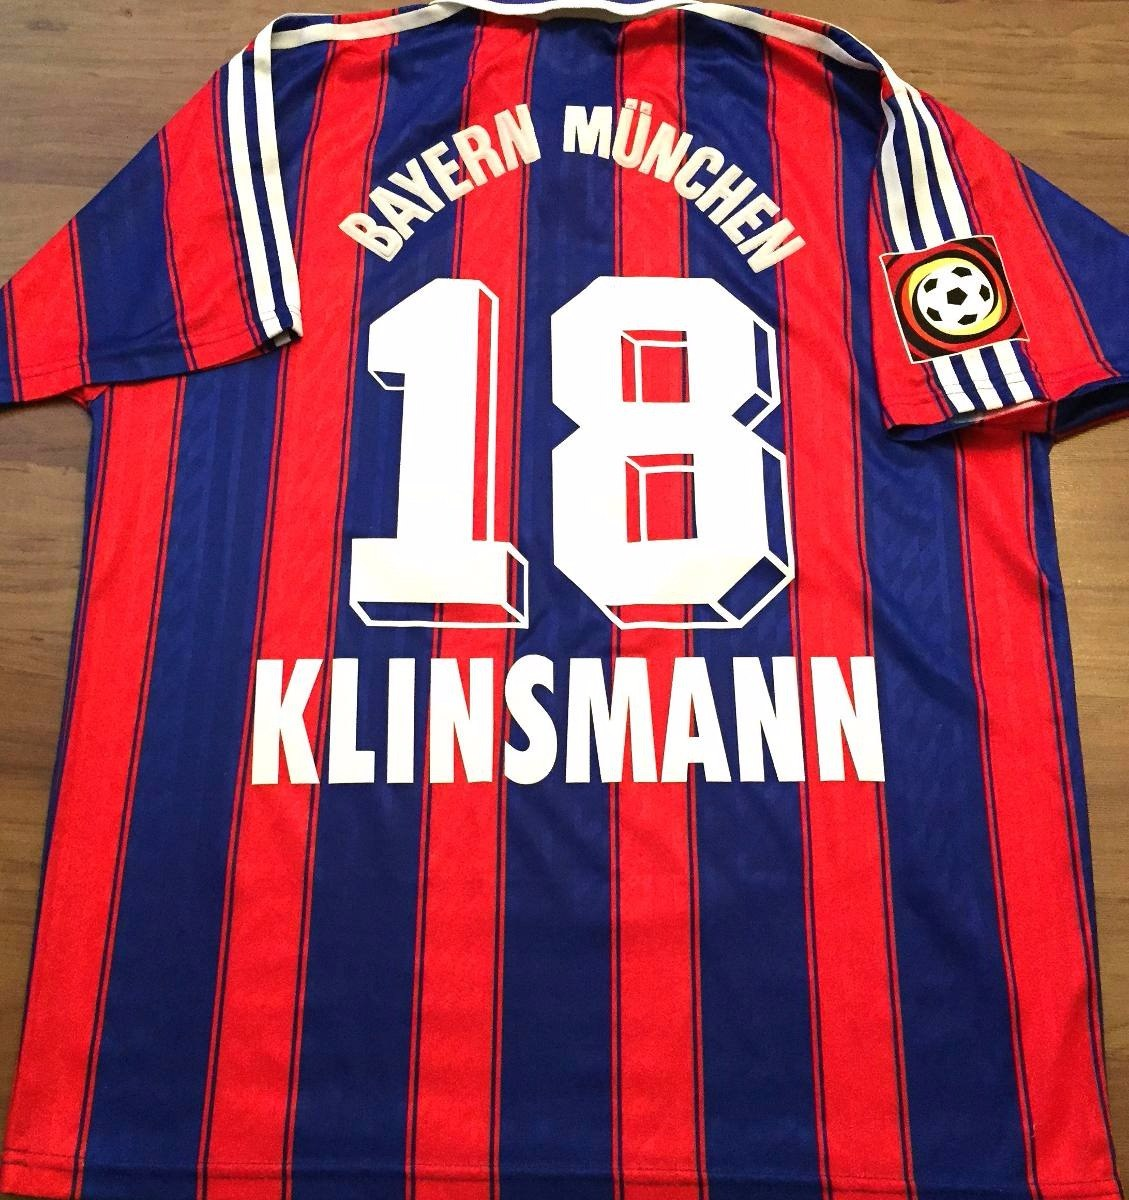 camisa do bayern munique 1995 96 kinsmann 18 bundesliga rara. Carregando  zoom. da18be4647738